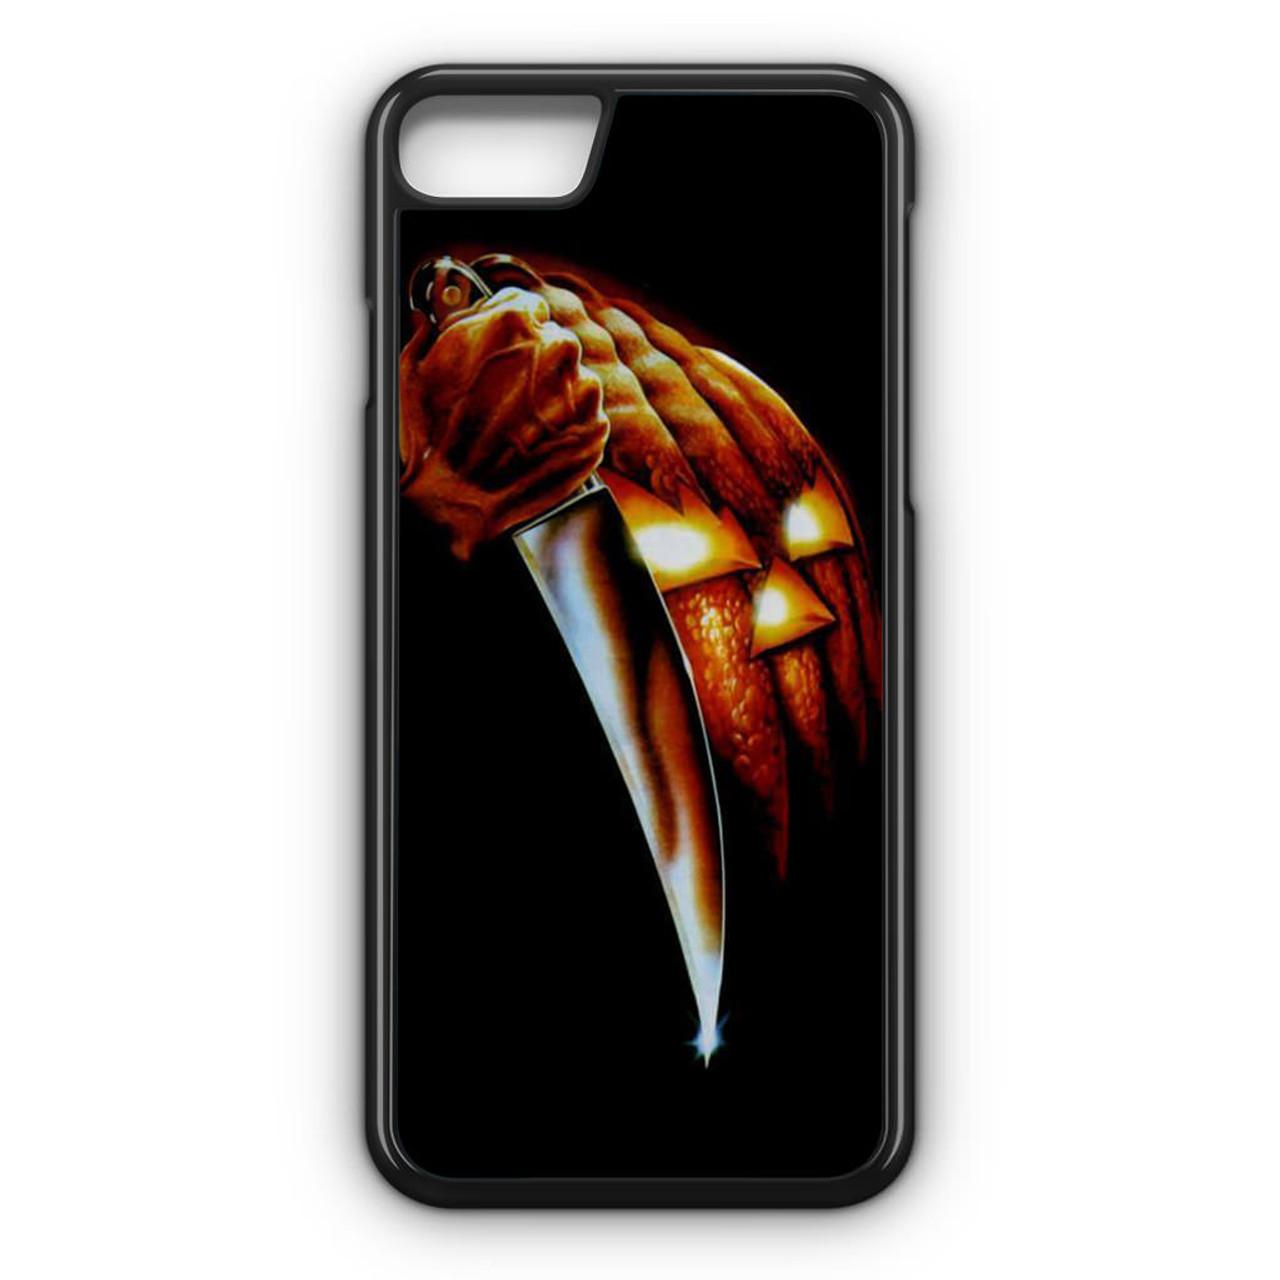 iphone 8 case halloween